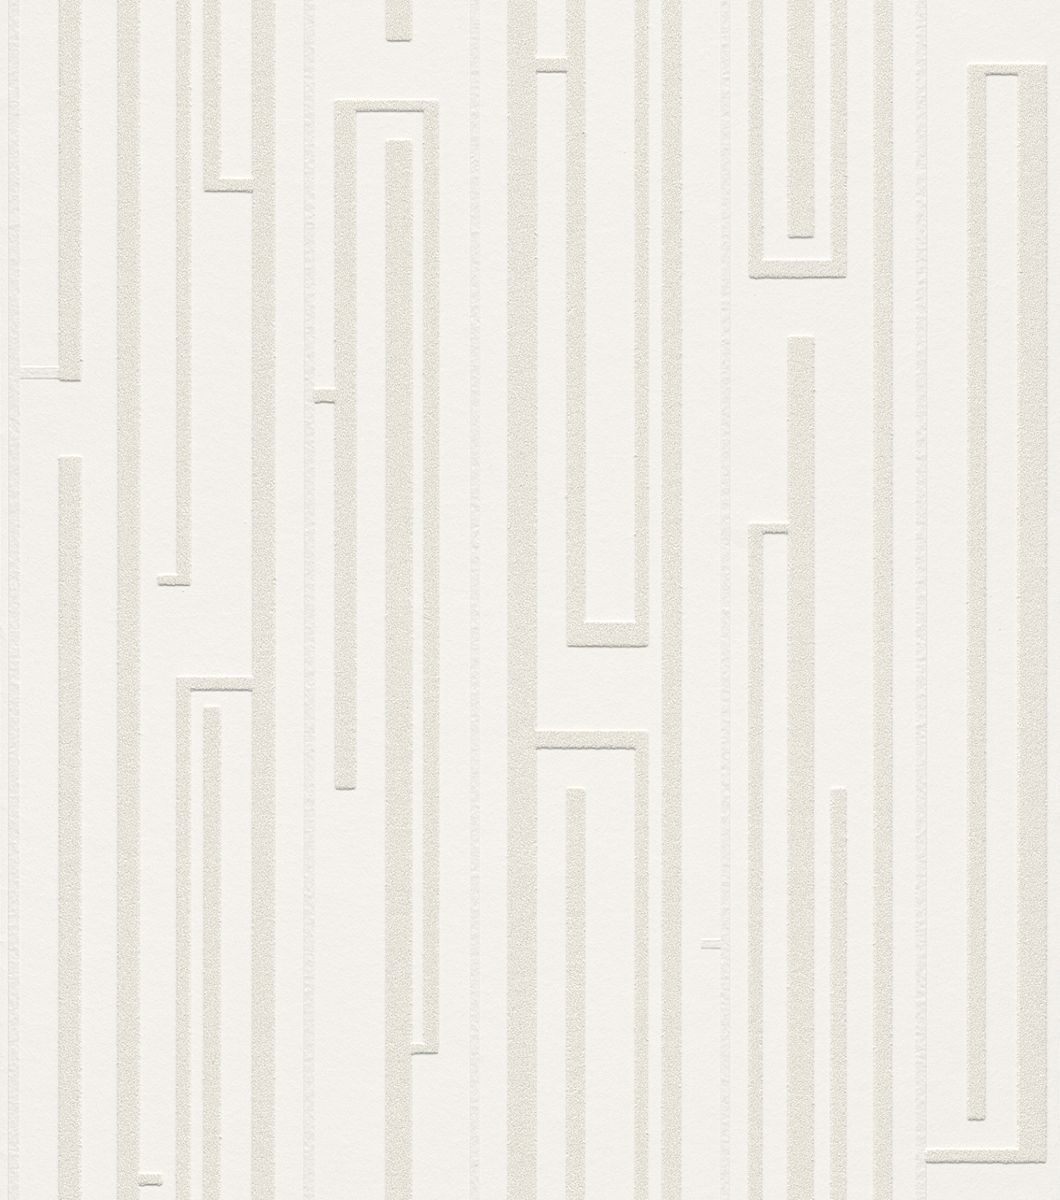 Tapete muster streifen cremewei vliestapeten rasch for Tapete muster